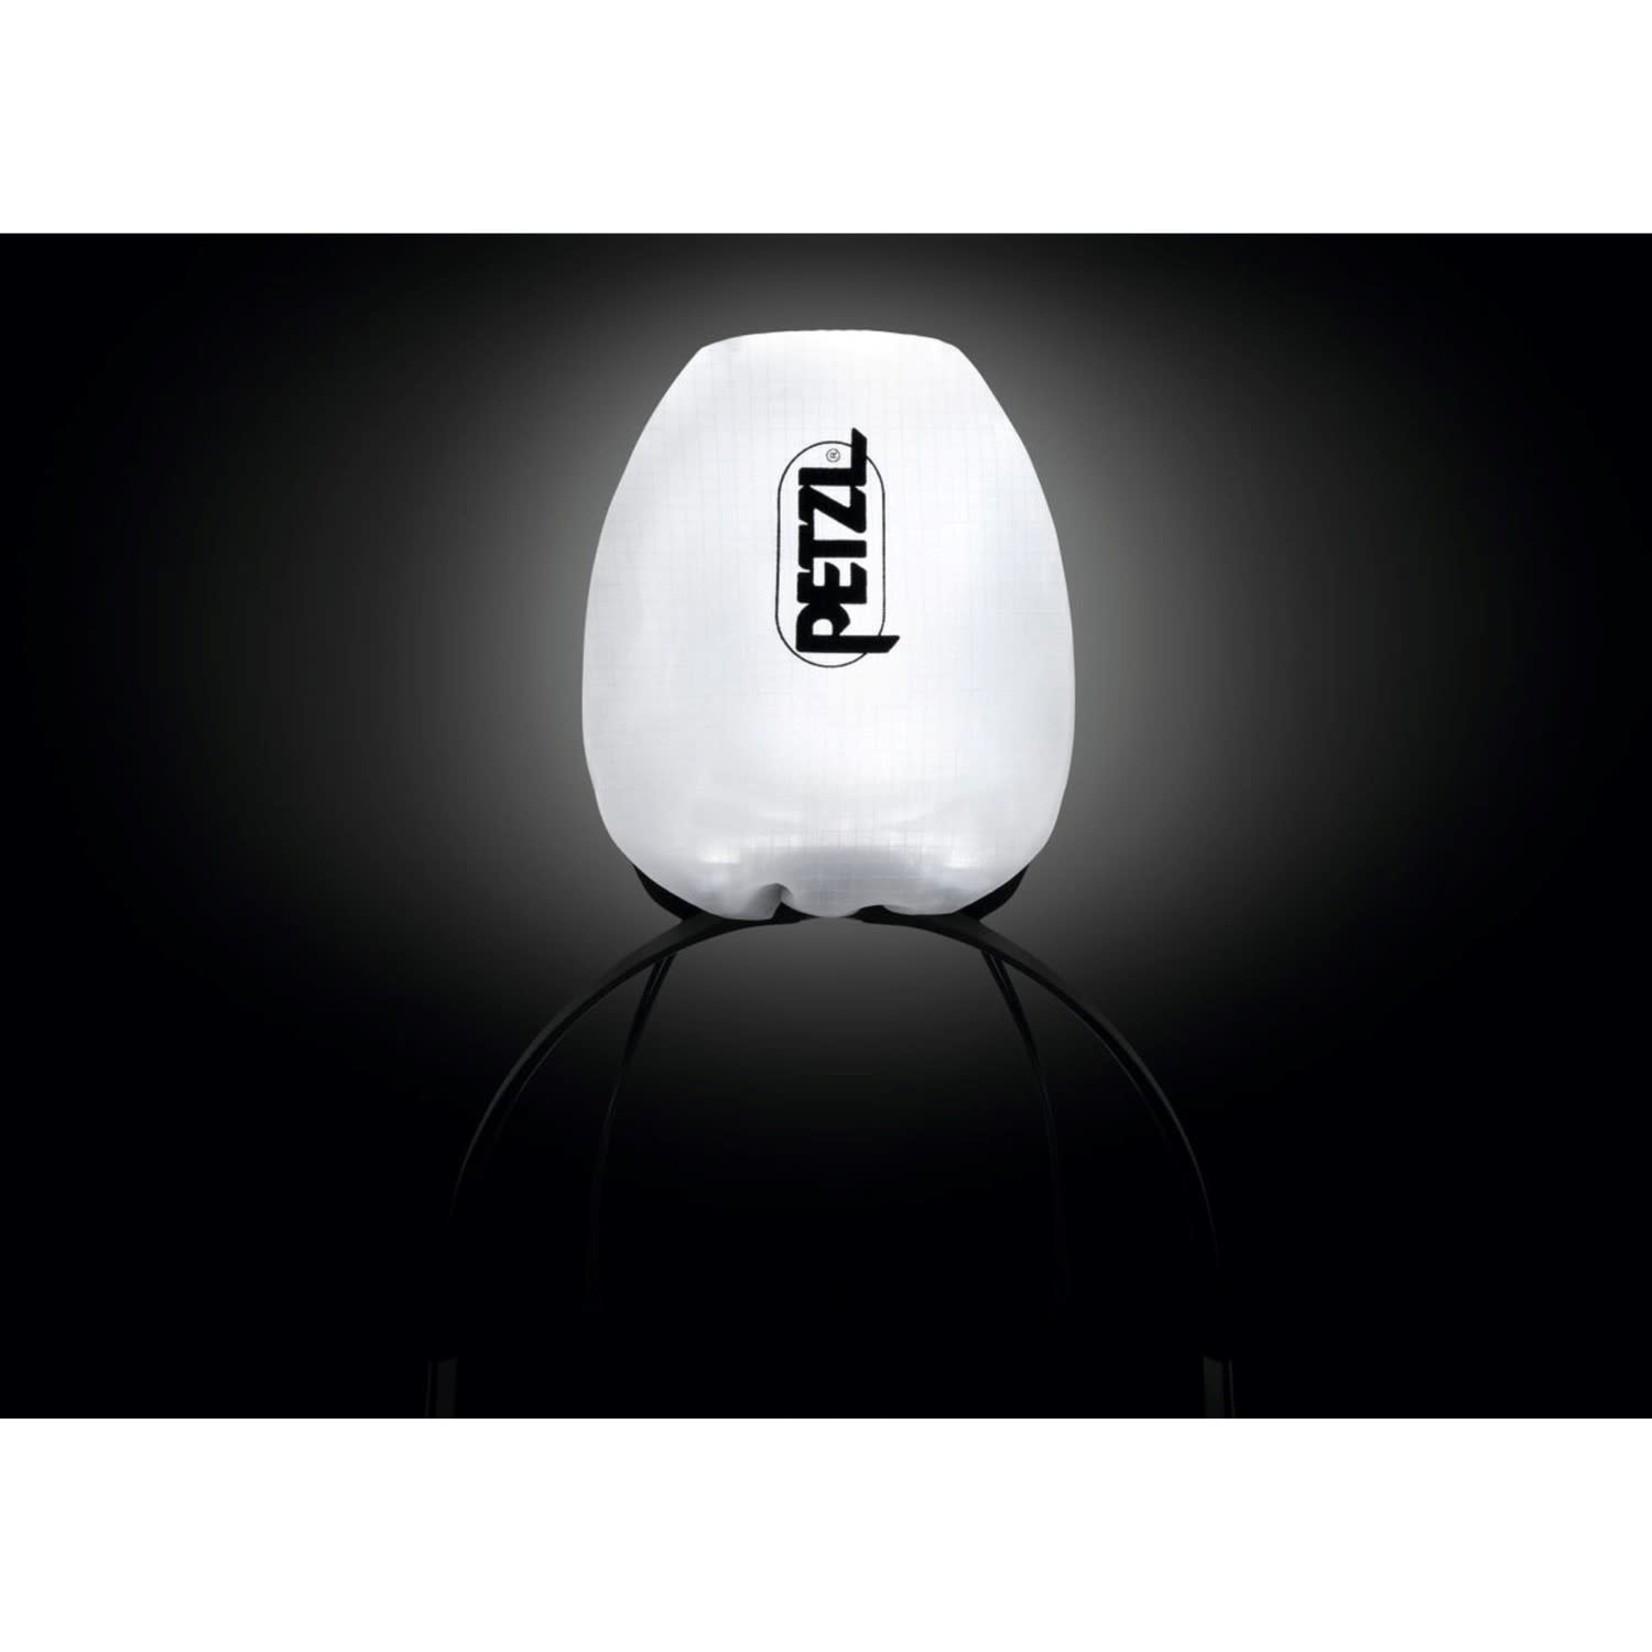 Petzl Lampe frontale Petzl Iko - 350 Lumen